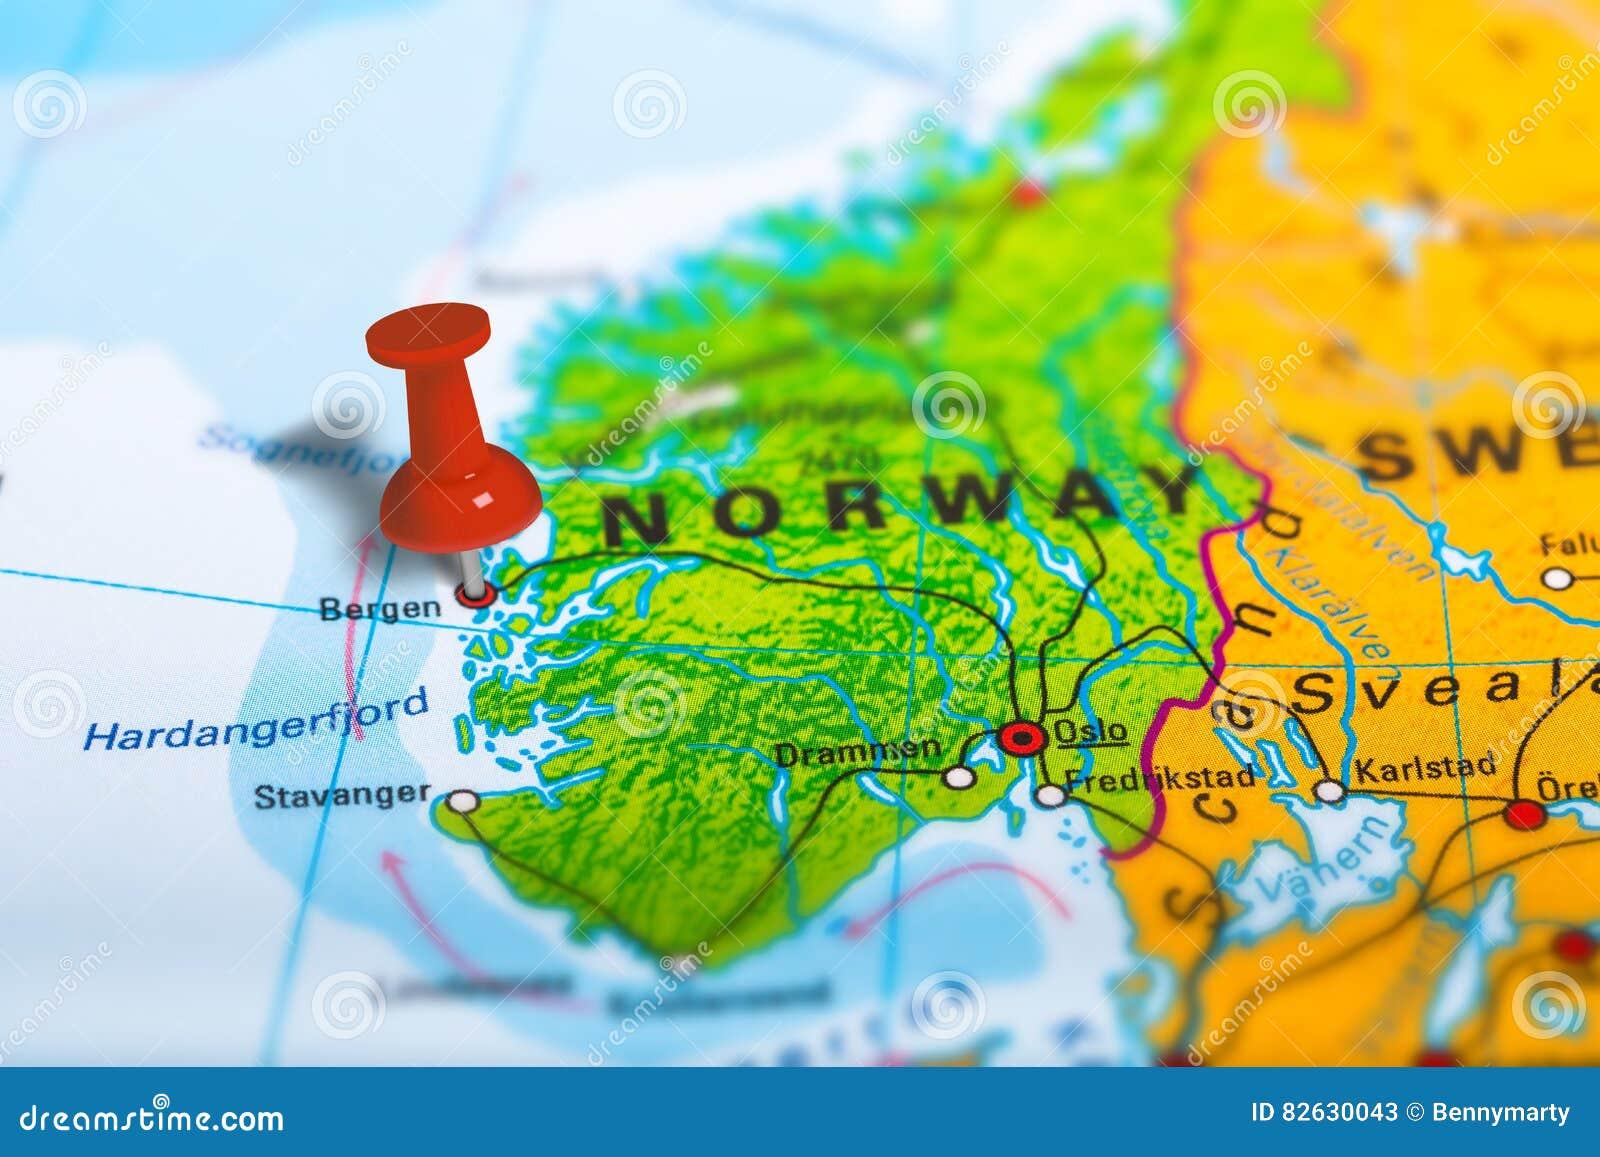 Bergen Norway Map Stock Photo Image - Norway map free download